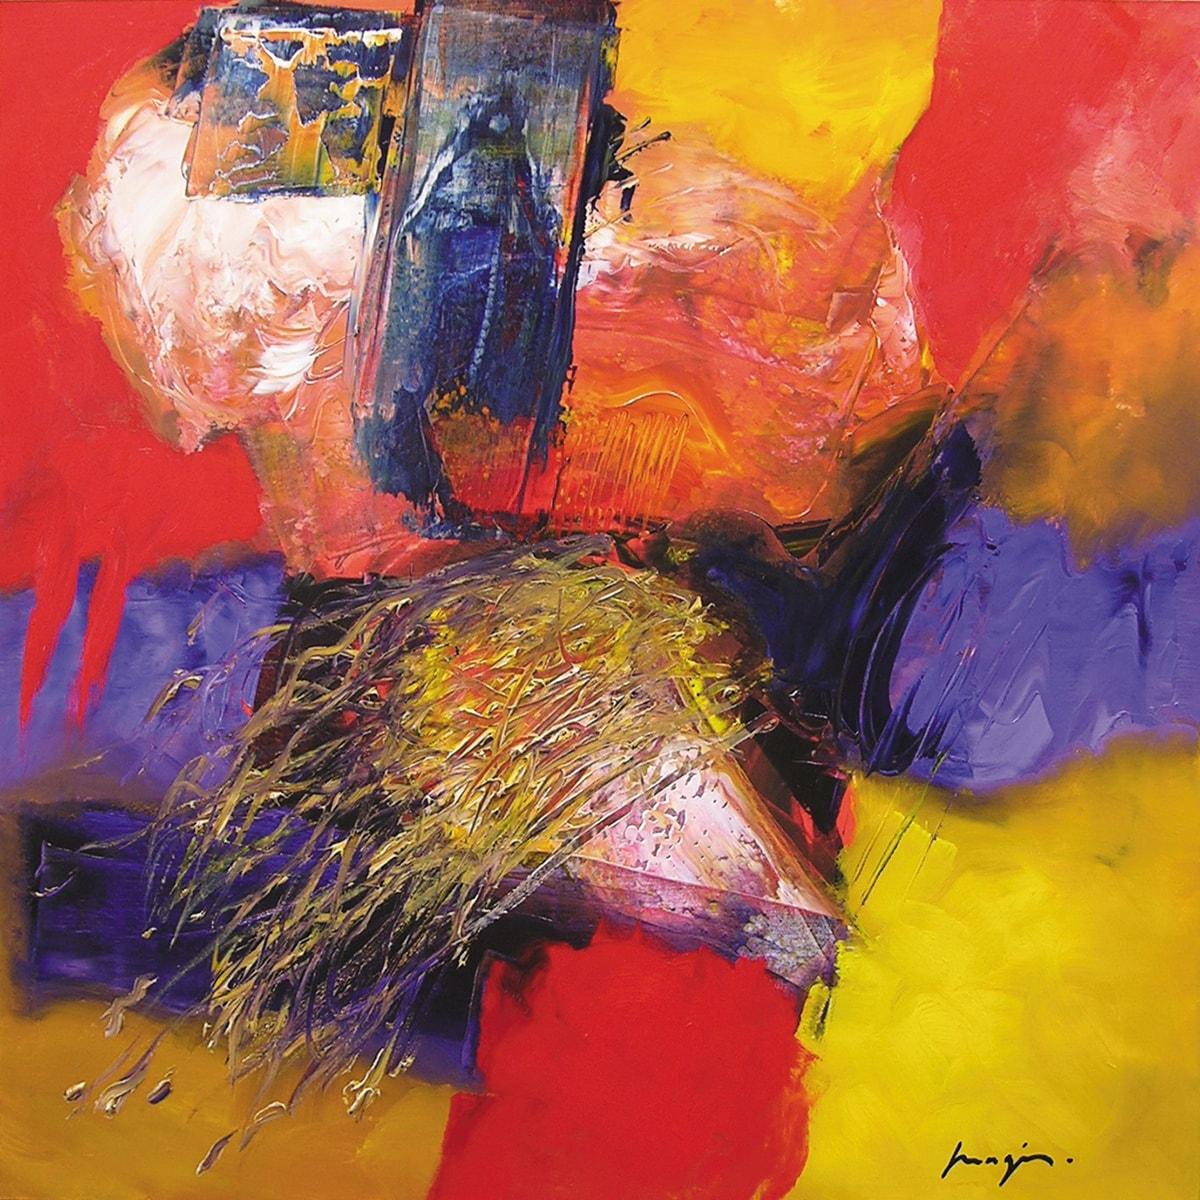 pascal magis - artiste peintre